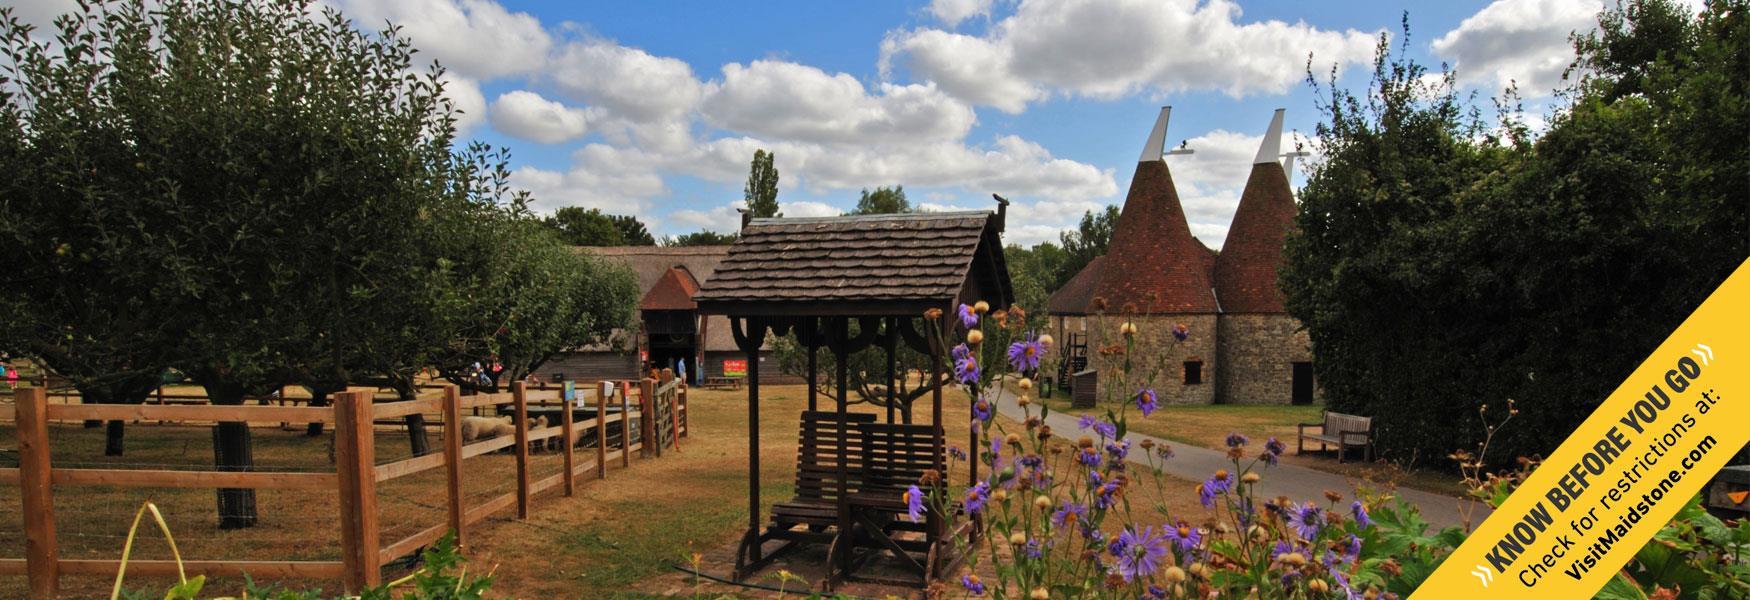 Kent Life Hertage Farm Park